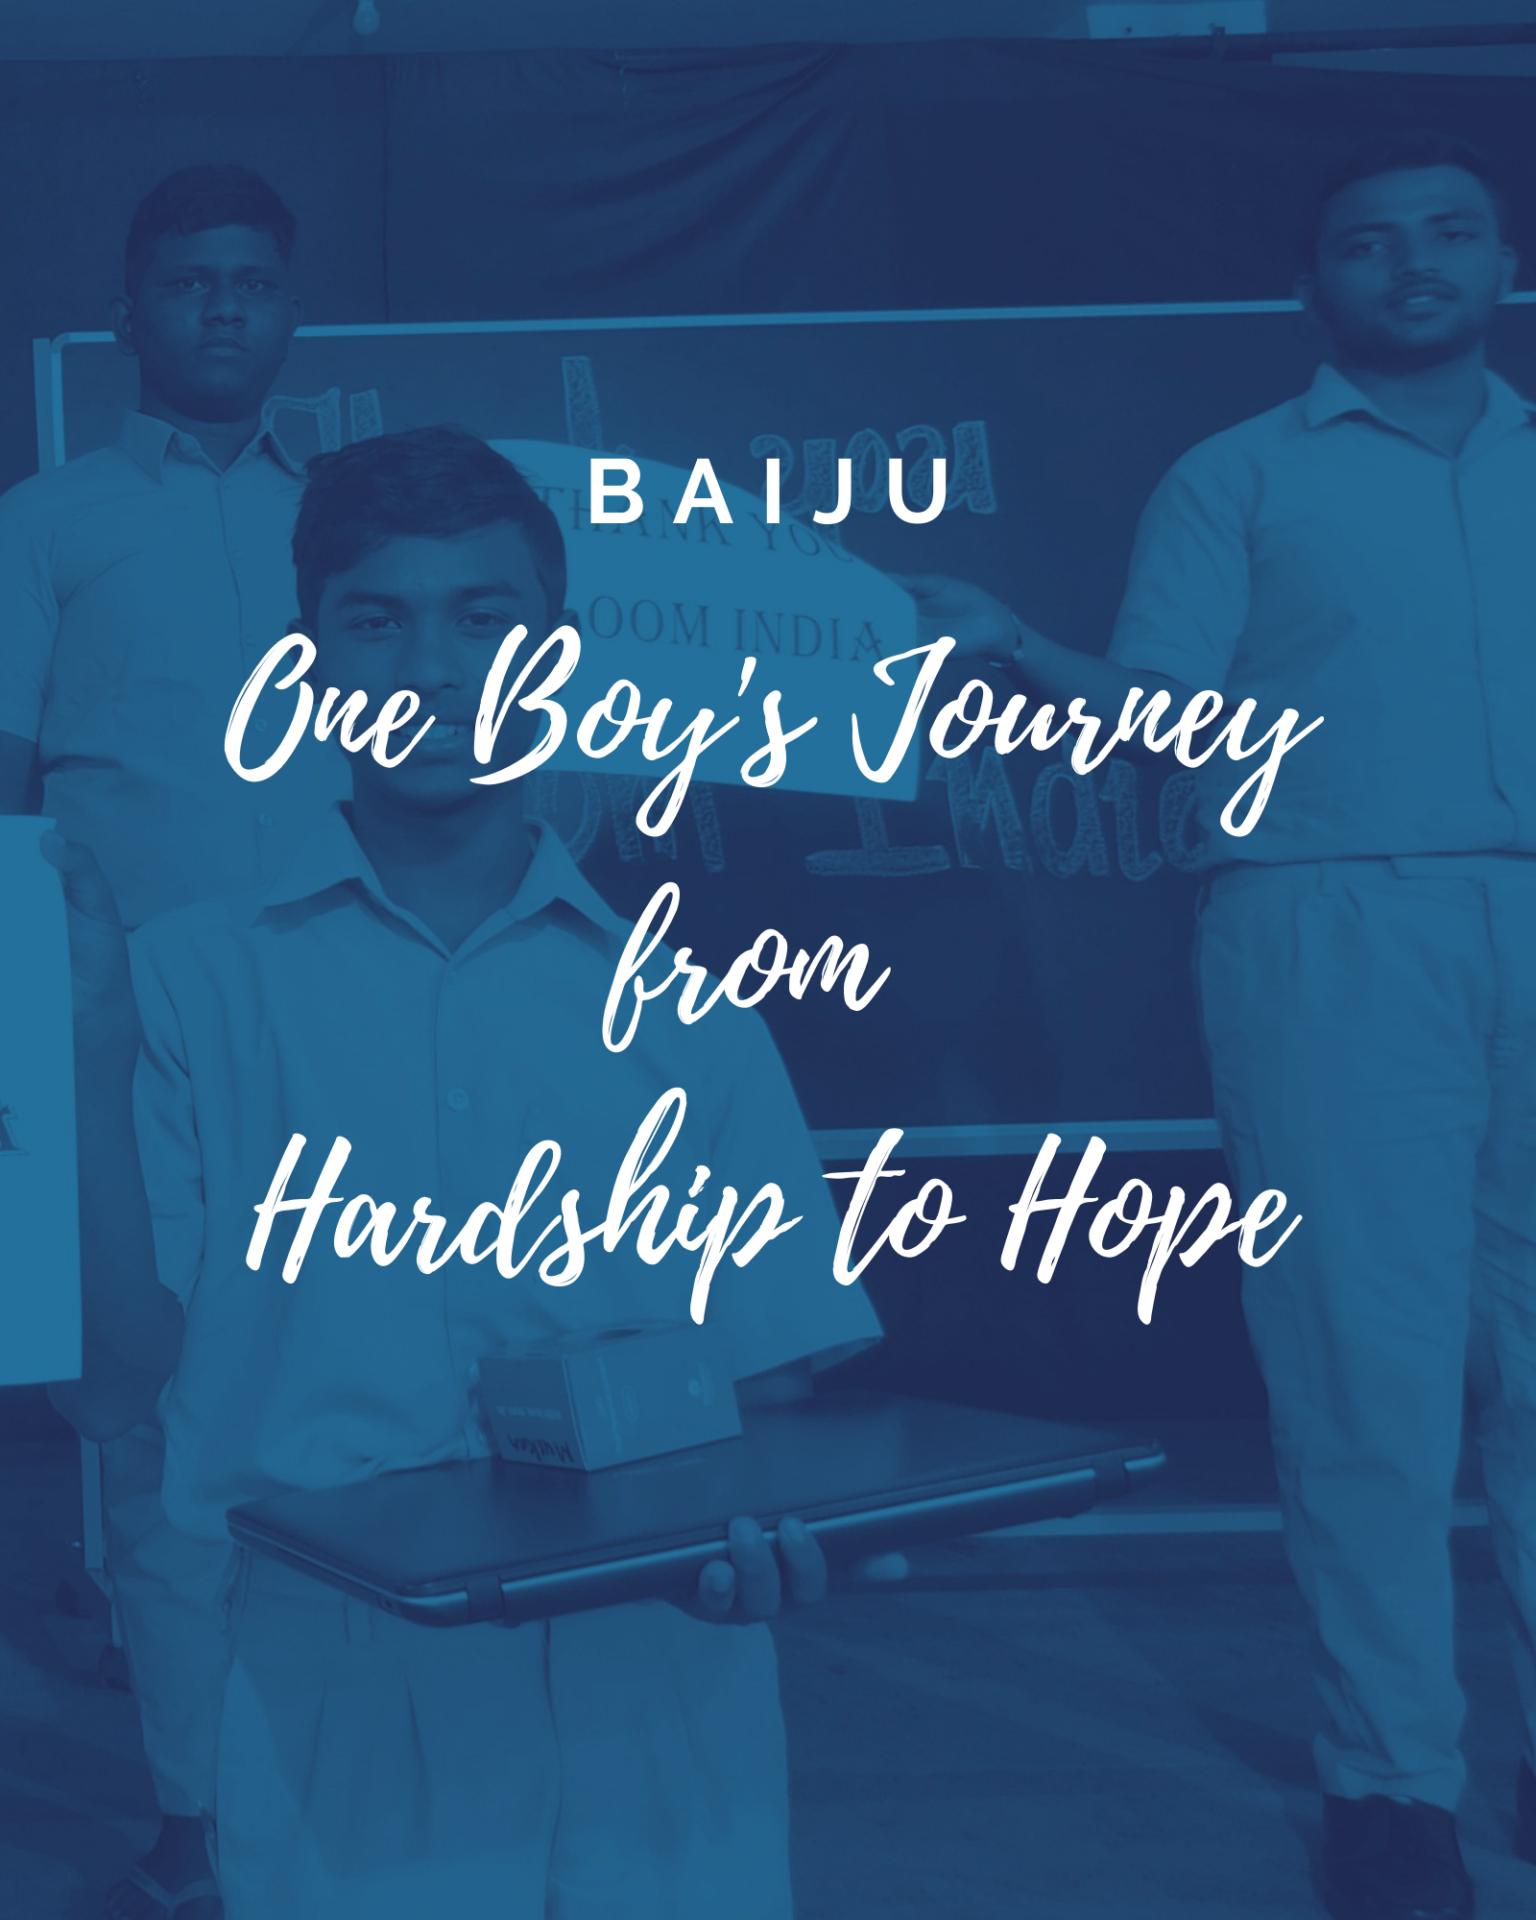 Baiju – Journey from Hardship to Hope